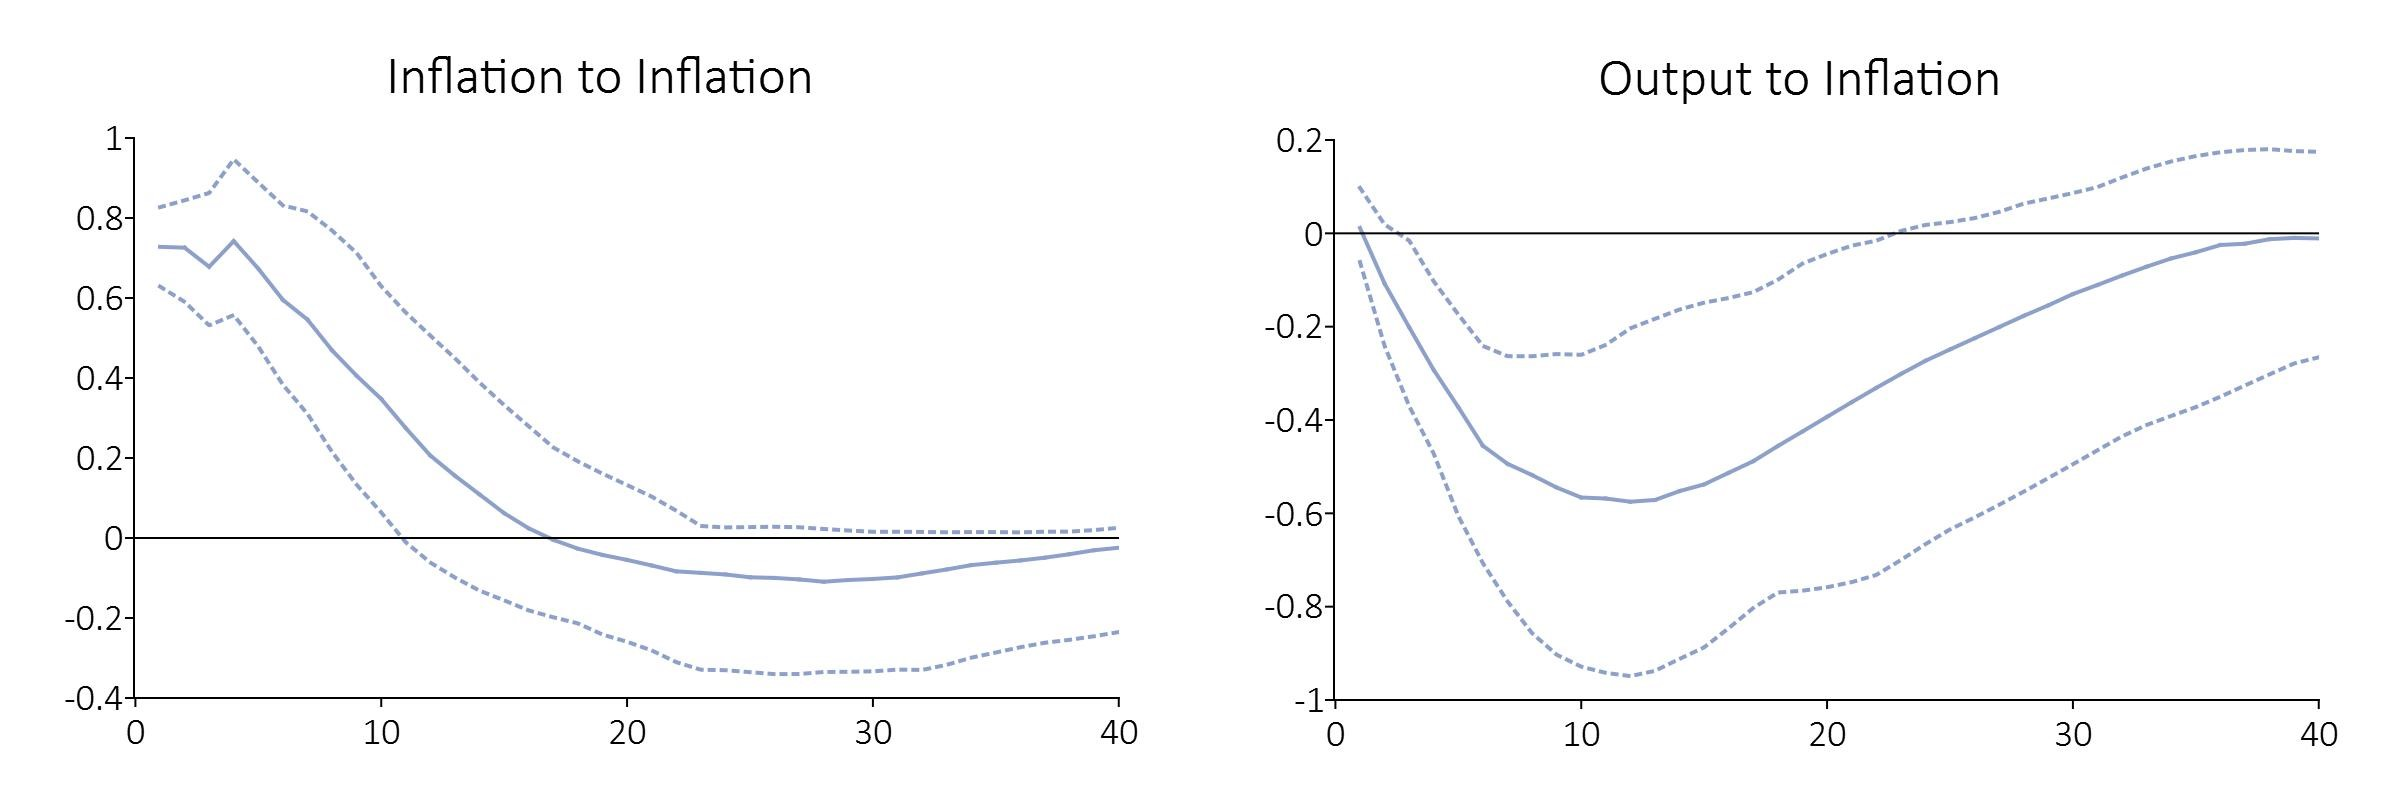 Impulse response functions after VAR estimation.